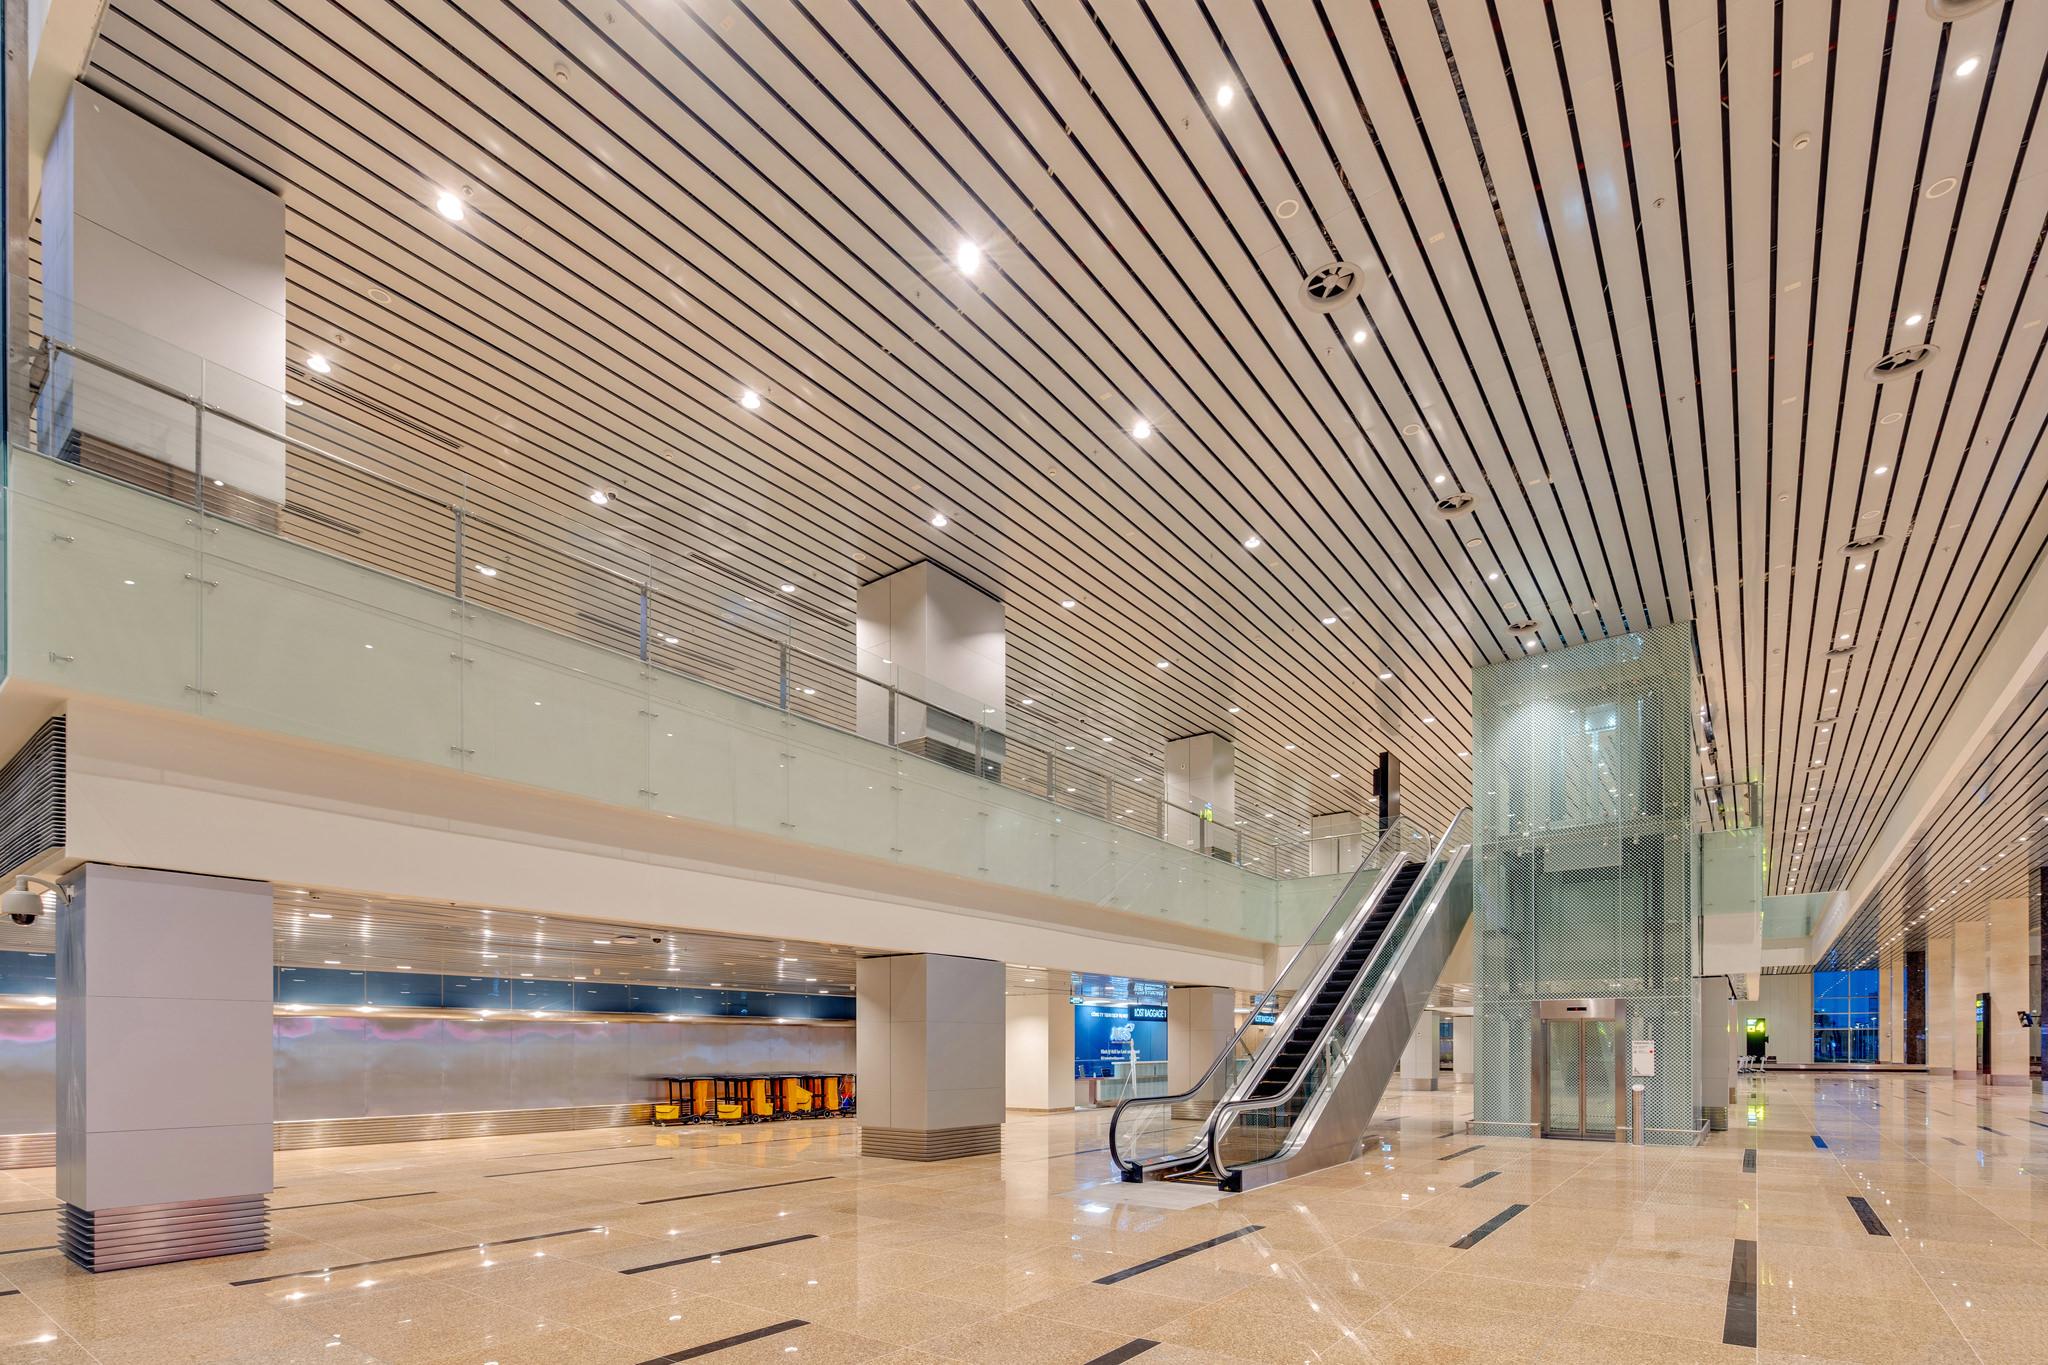 20180626 - Cam Ranh Airport - Architecture - 0408.jpg